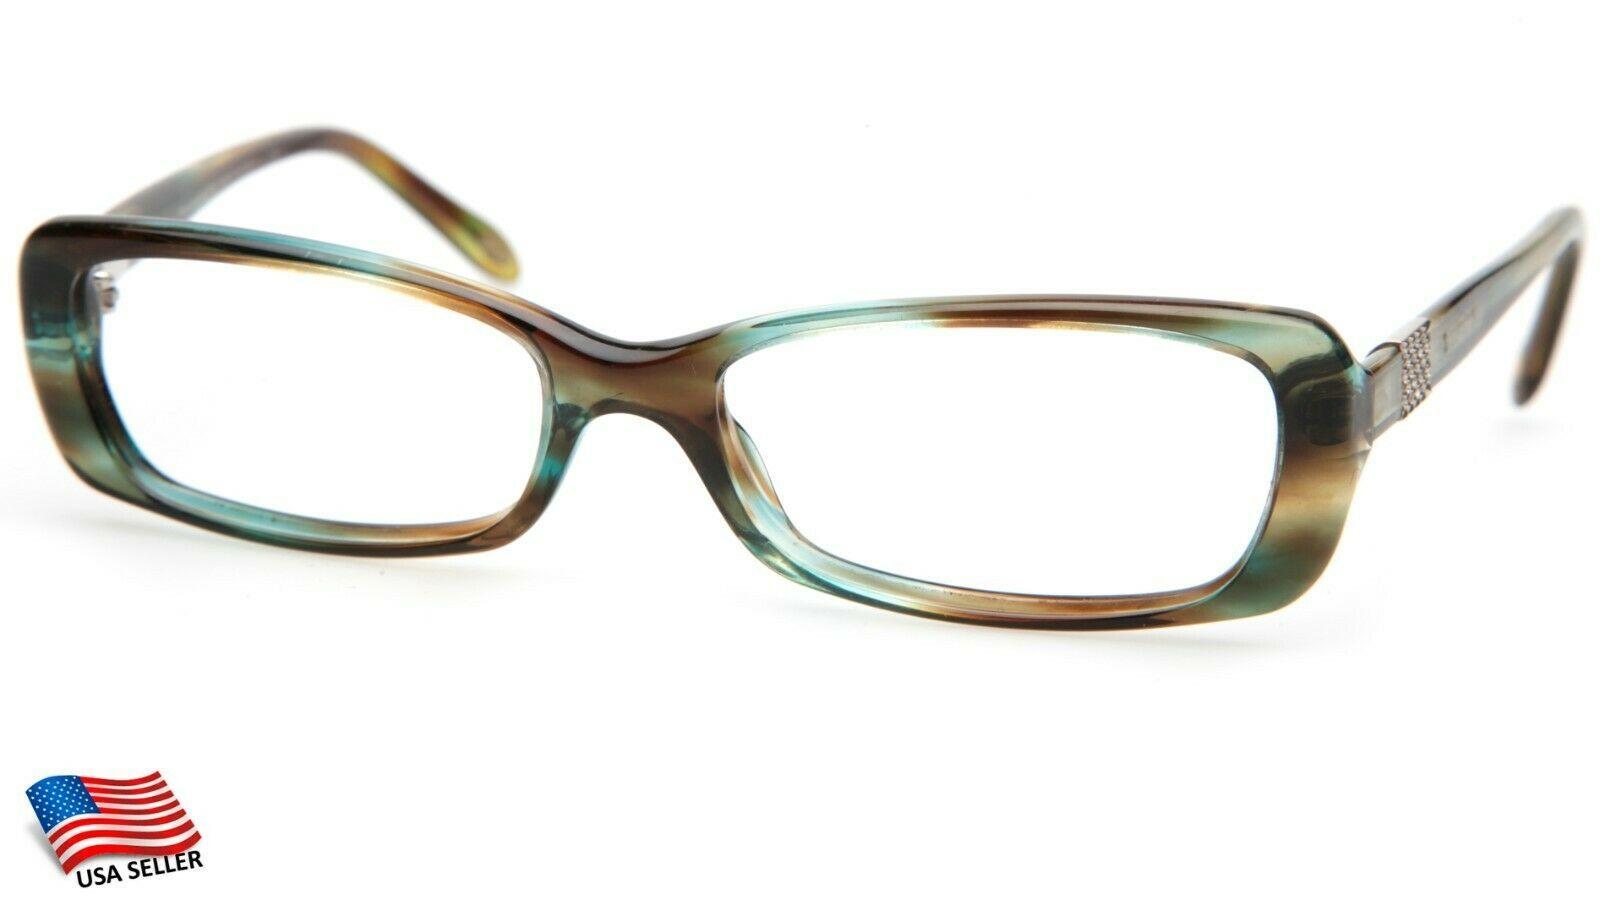 TIFFANY & Co TF 2070-B 8124 Ocean Green EYEGLASSES FRAME 53-16-135mm (NO DEMOS) - $103.93